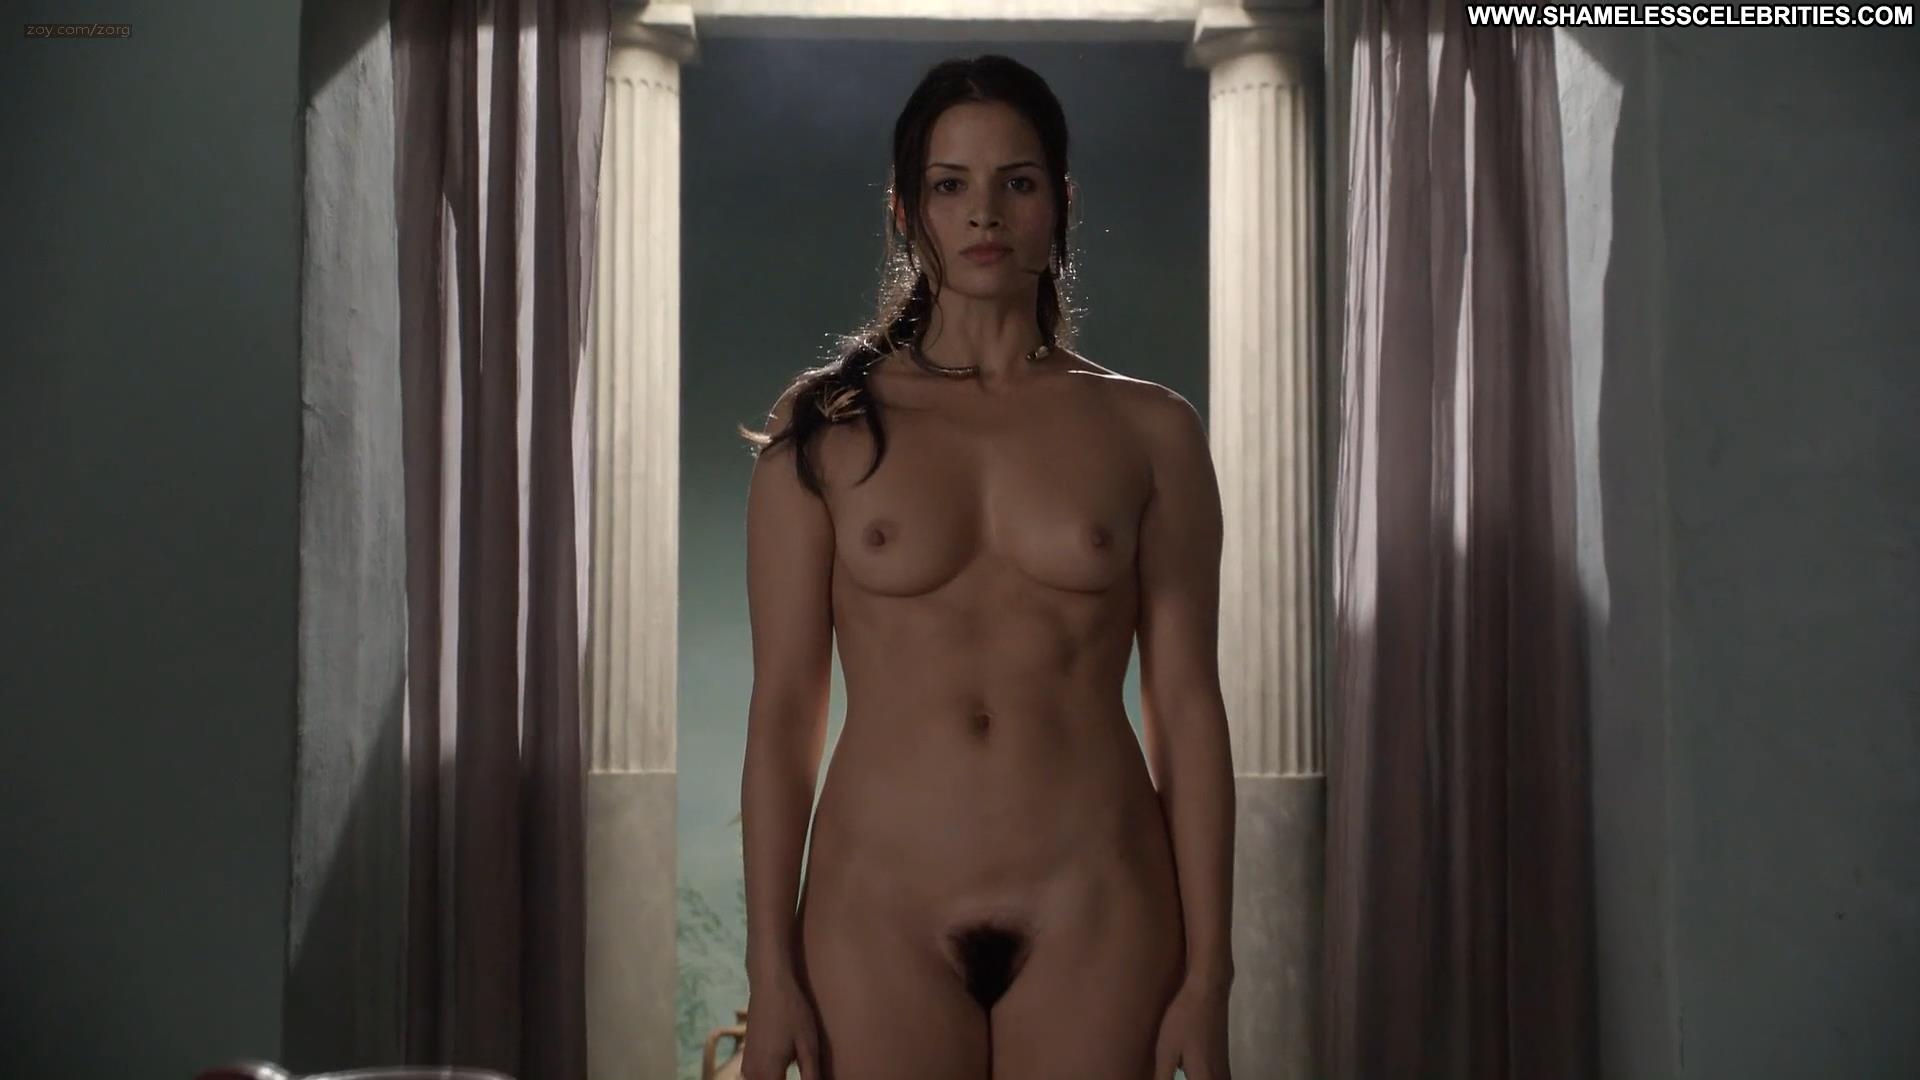 Playgirl celebrity nudes-9902